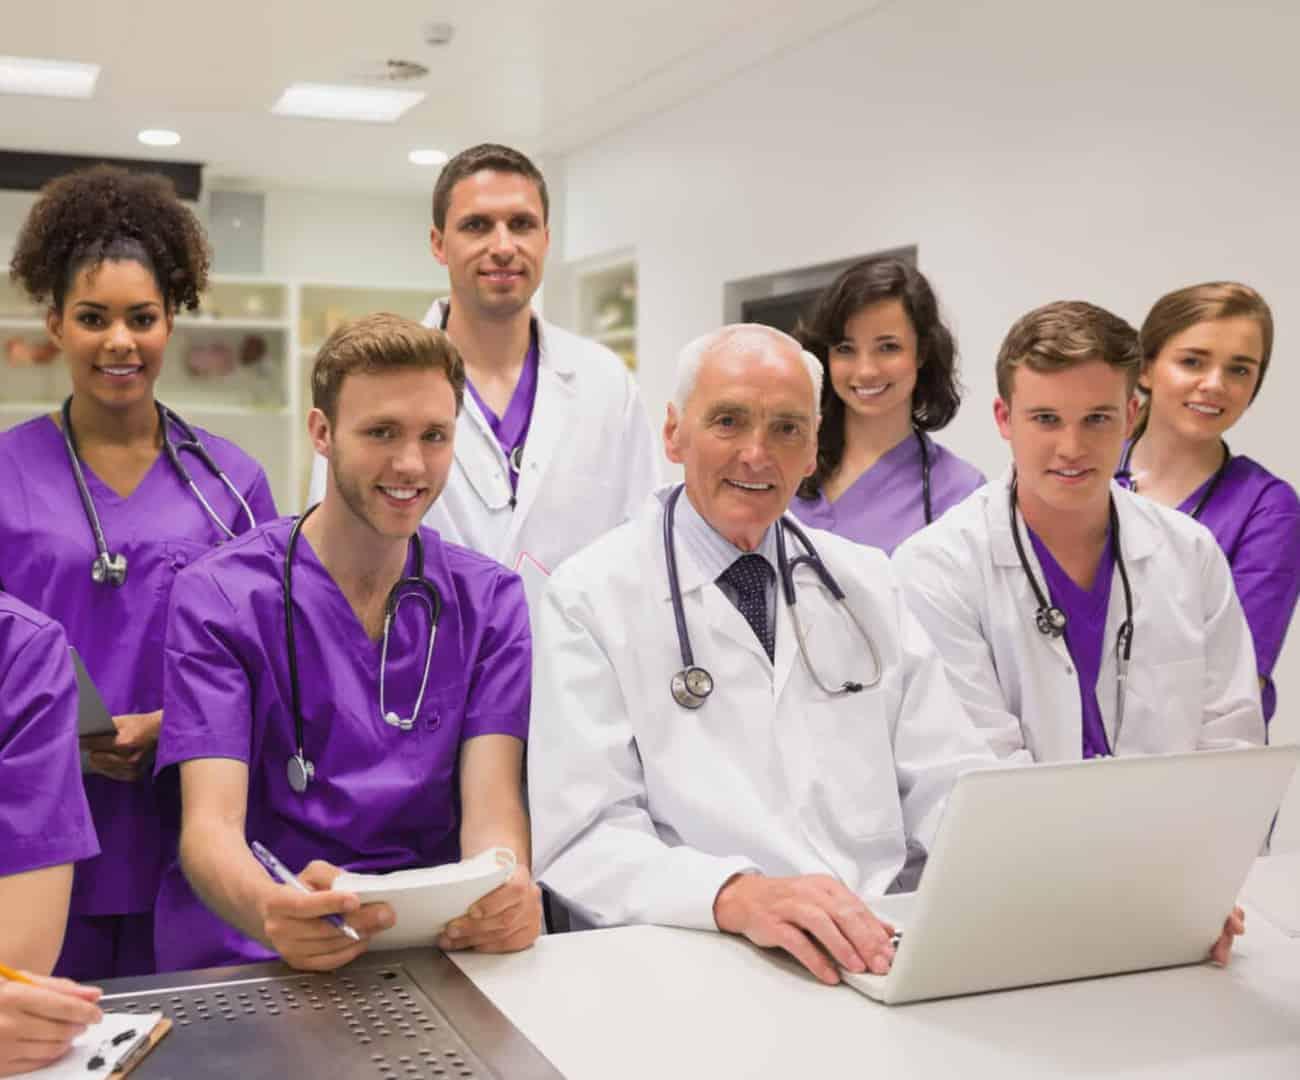 Veterinary-Medicine-Students -with-Teacher-1